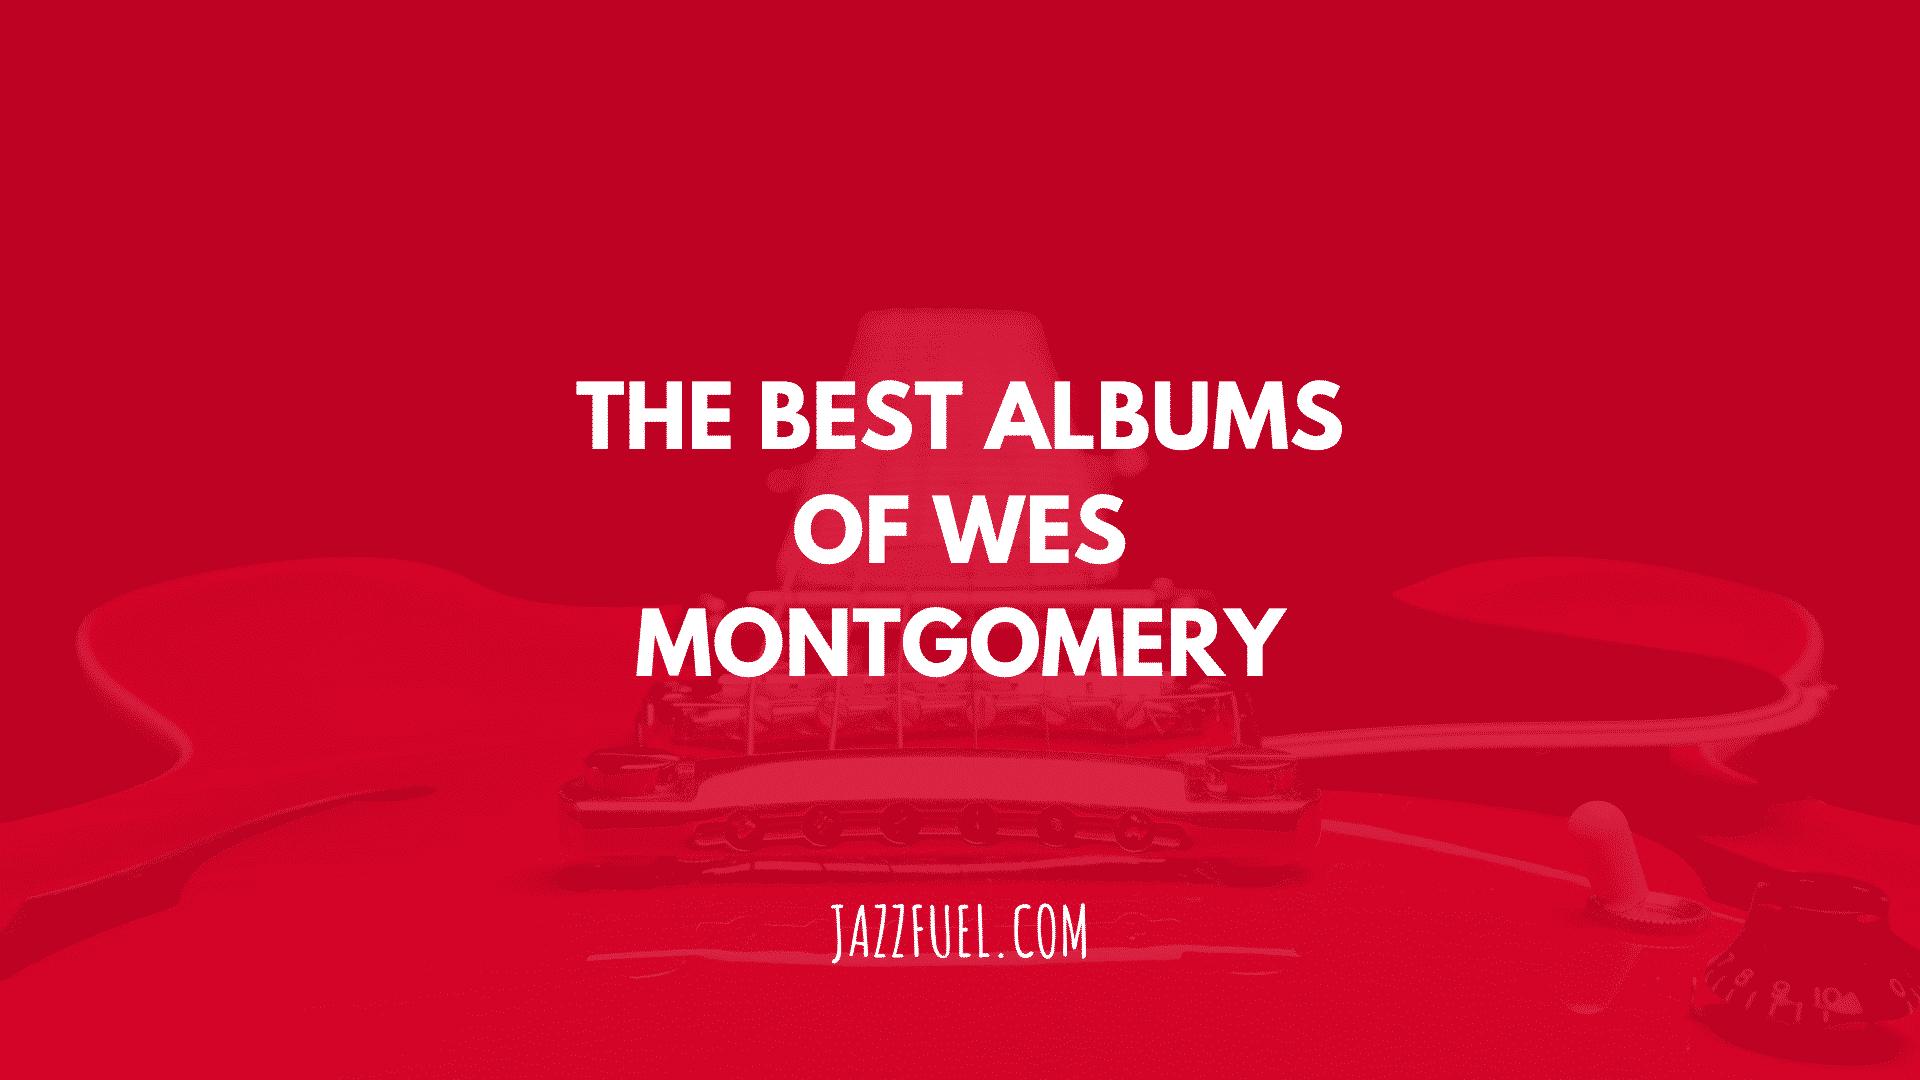 Wes Montgomery albums